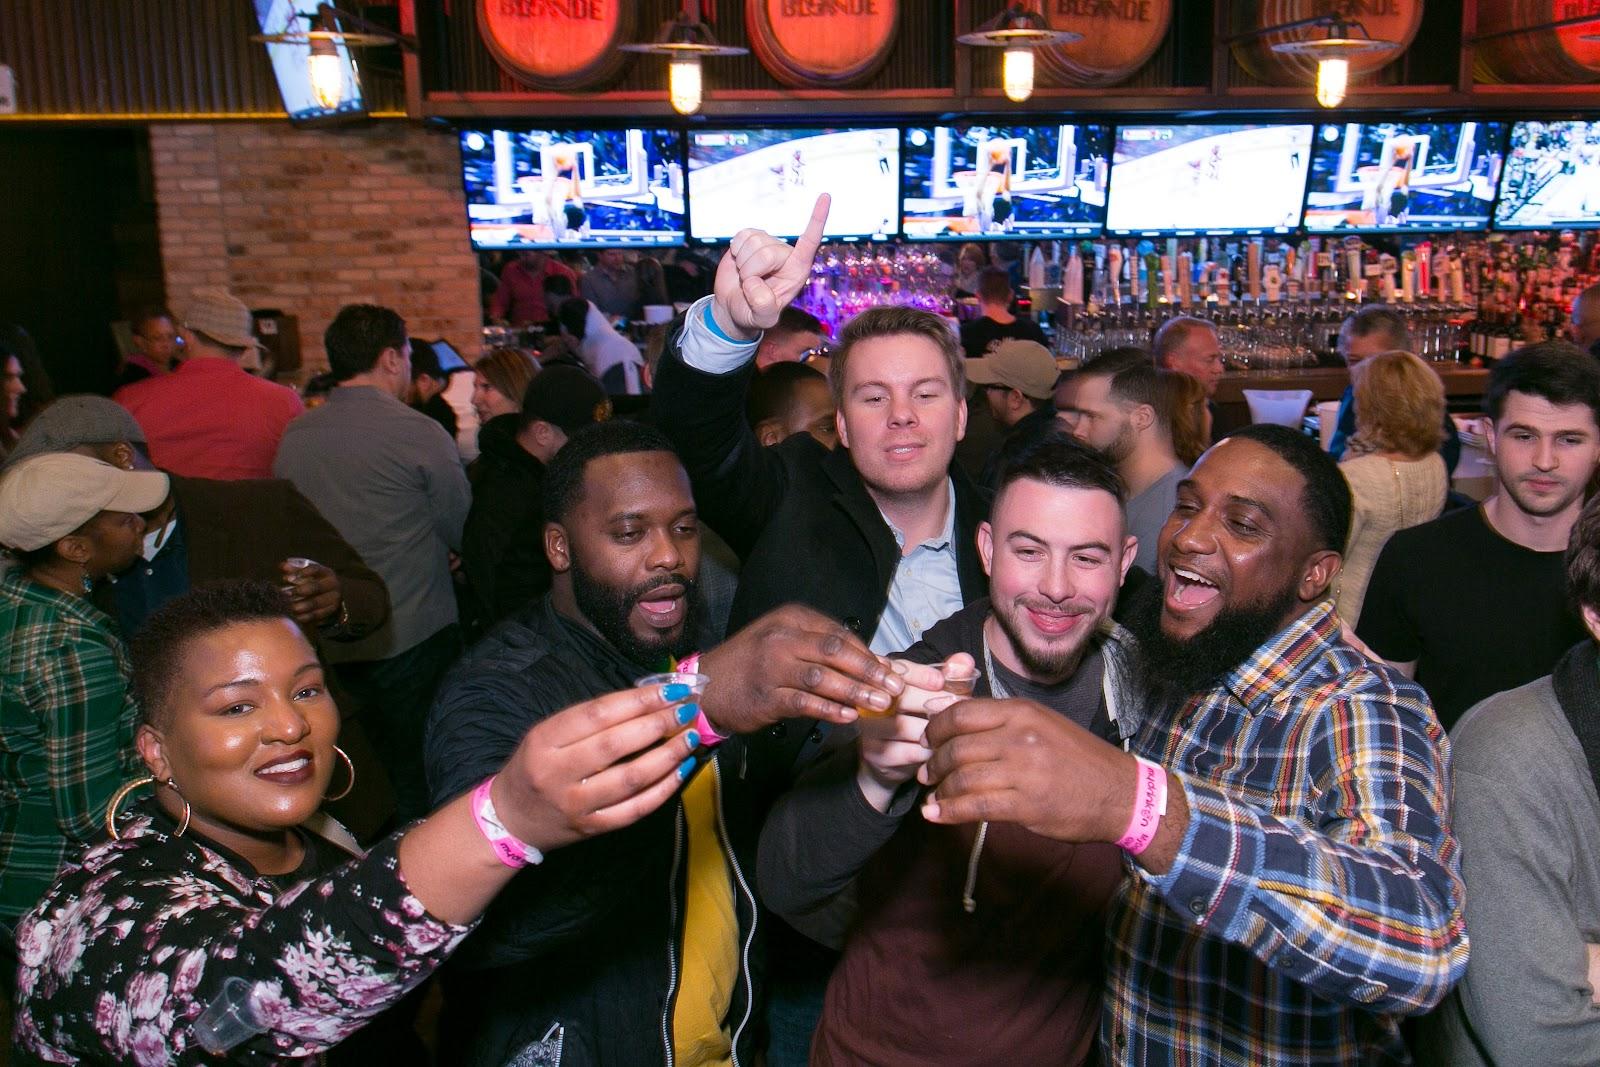 Cheers-Shot-Social-Scene-Tasting